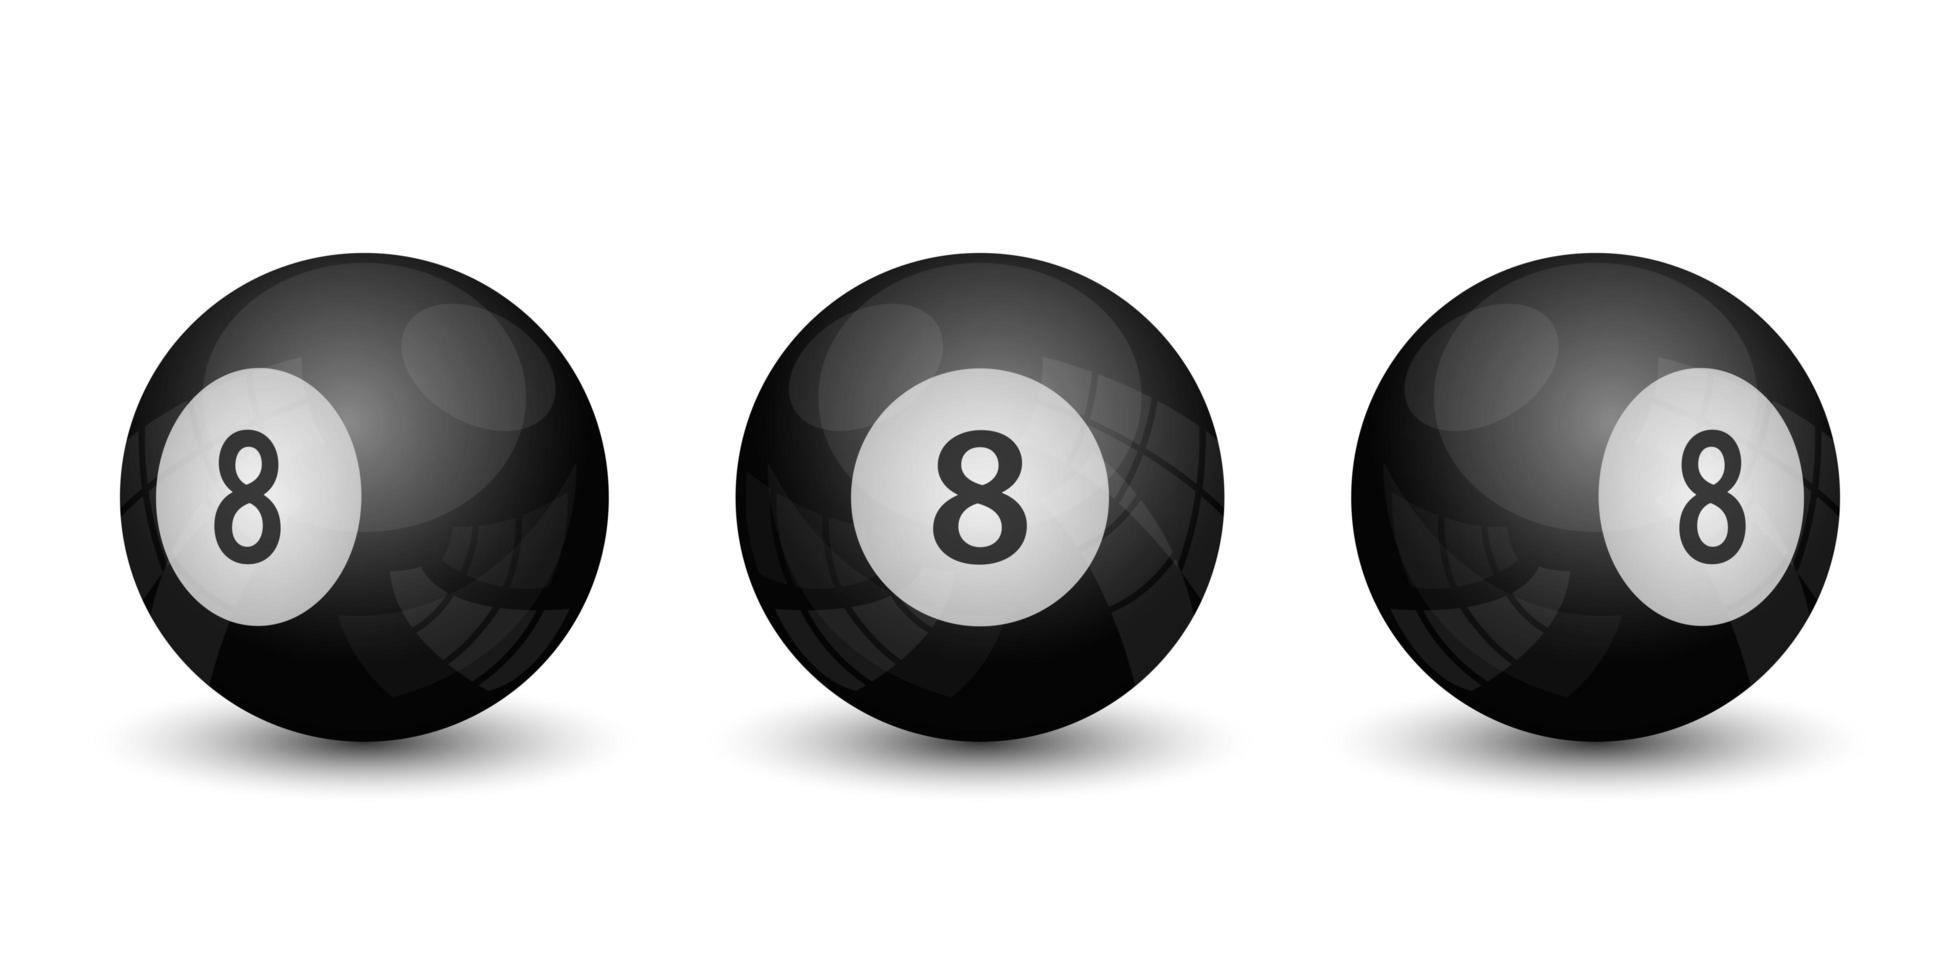 jogo de bilhar bola oito isolado no fundo branco vetor